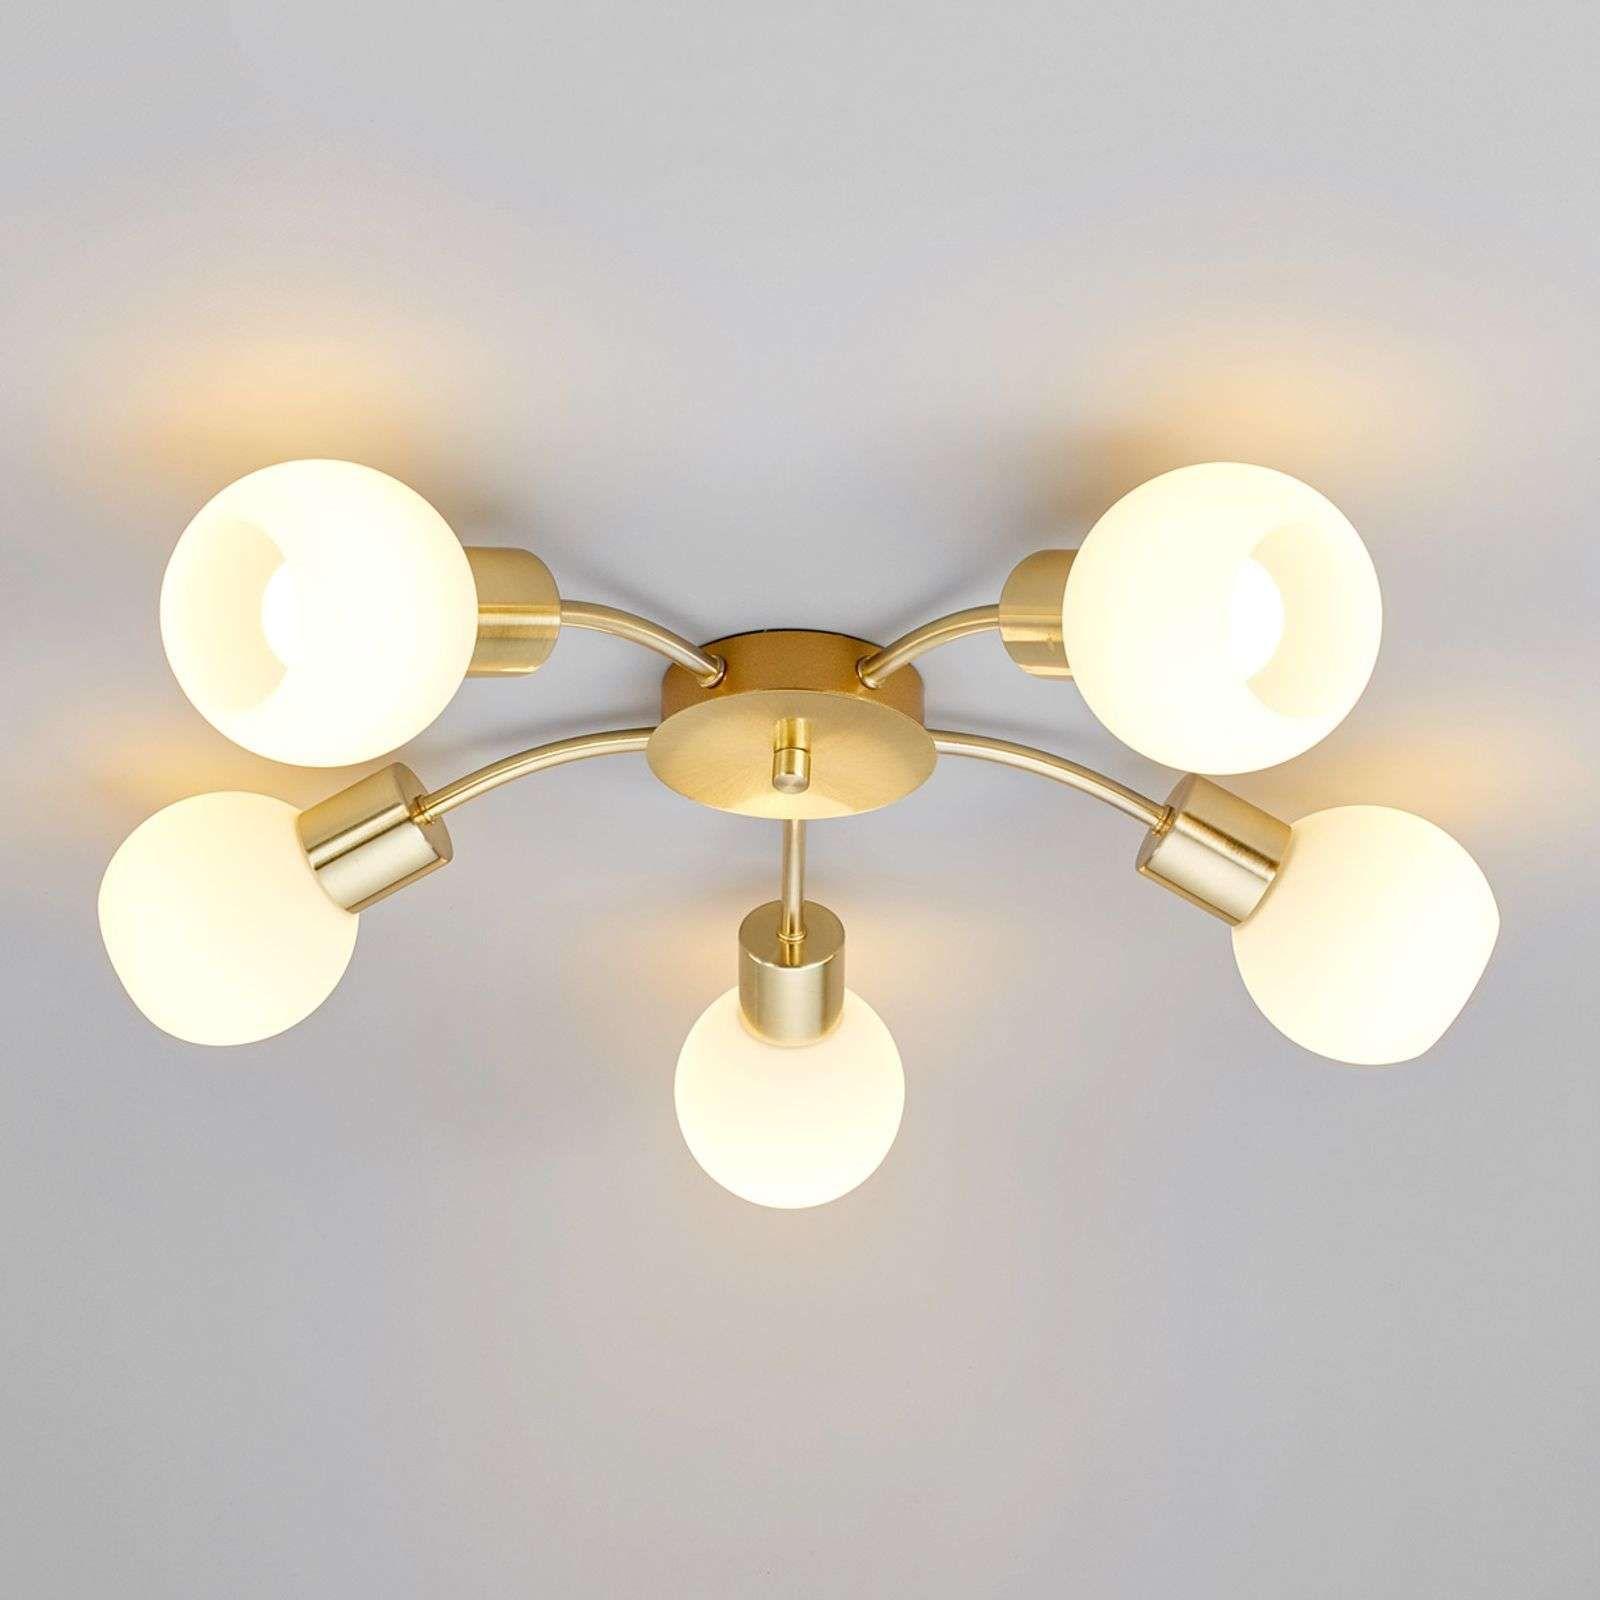 Led Verlichting Woonkamer Plafond Plafondlamp Hout Design Plafondlamp Slaapkamer Kwantum Plafonnier Led Philips H Plafondlamp Plafondverlichting Led Lamp